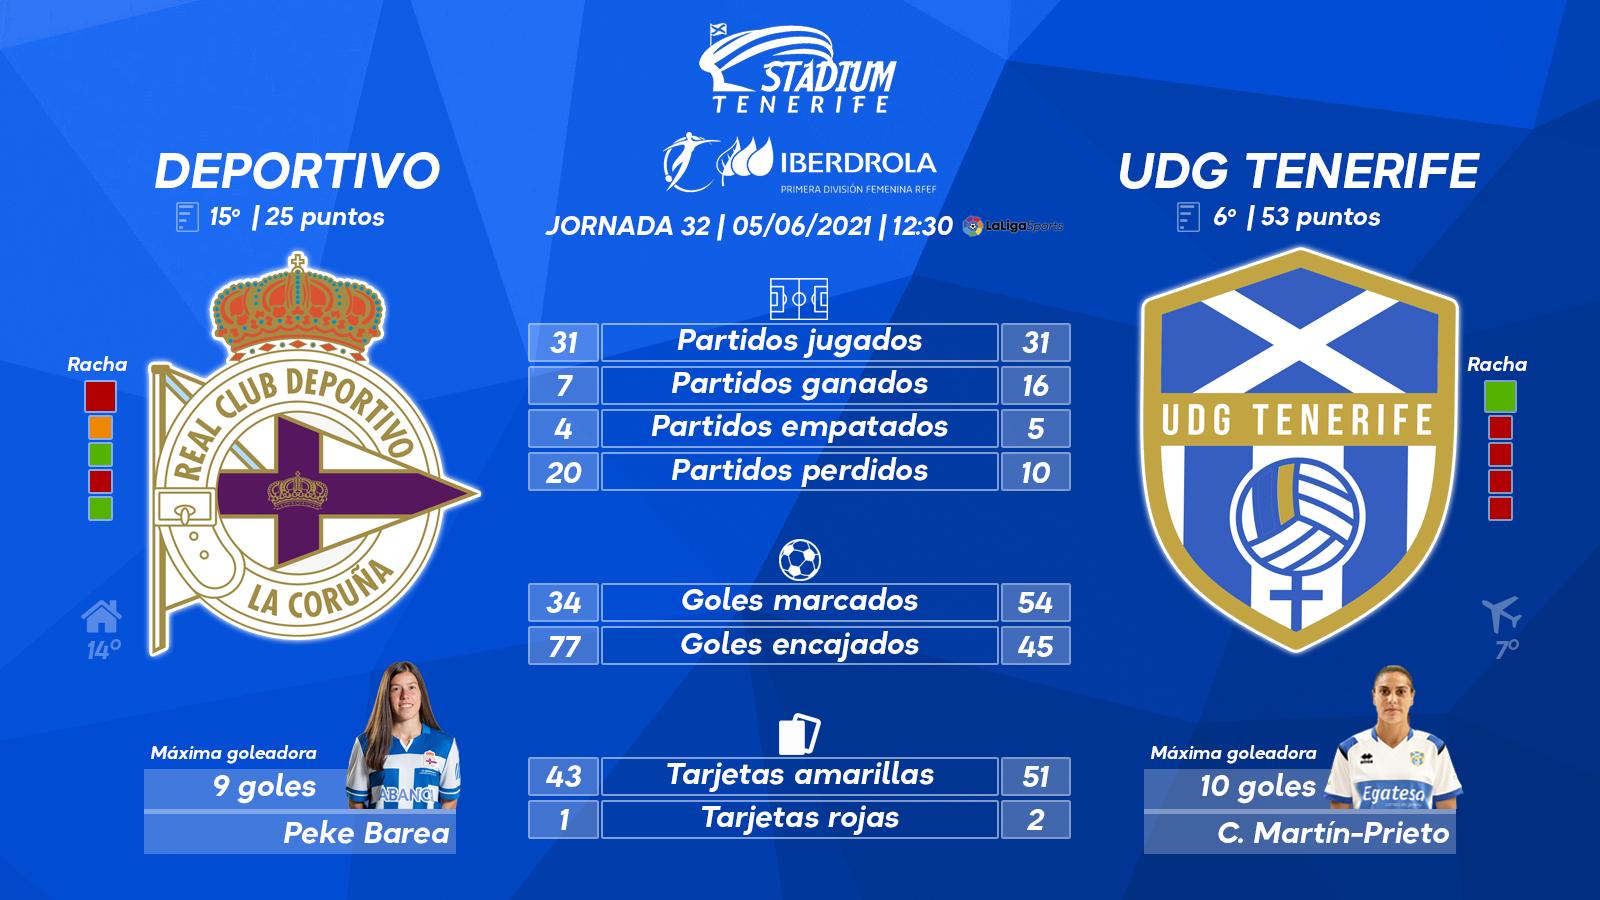 Previa del Deportivo Abanca - UDG Tenerife (32ª J.-Primera Iberdrola)